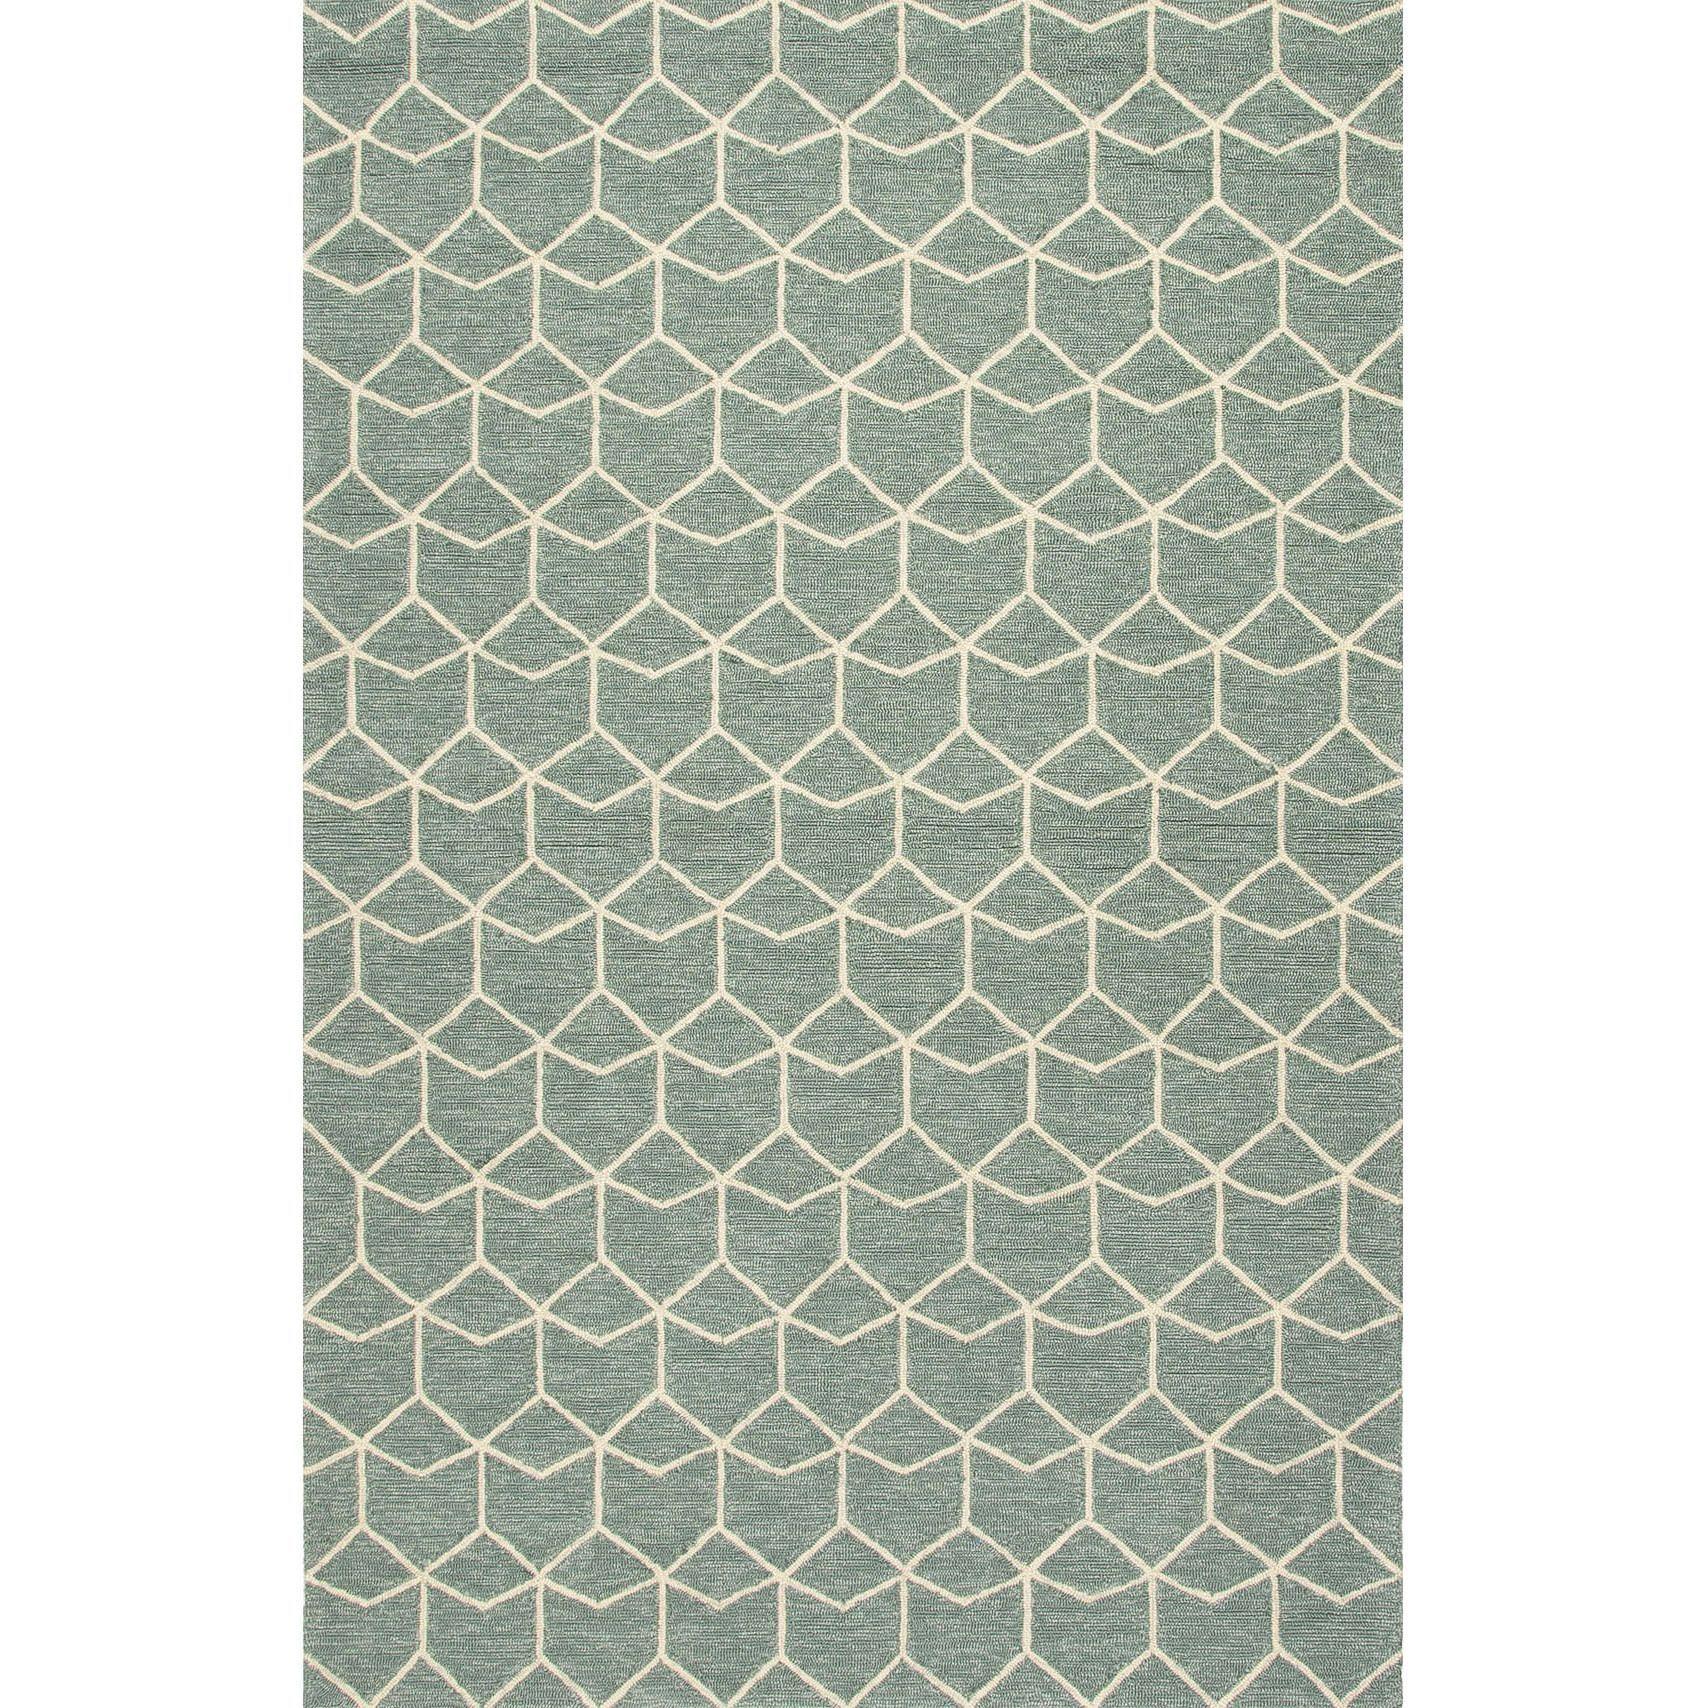 Finbar Indoor Outdoor Geometric Green Cream Area Rug 3 6 X 5 6